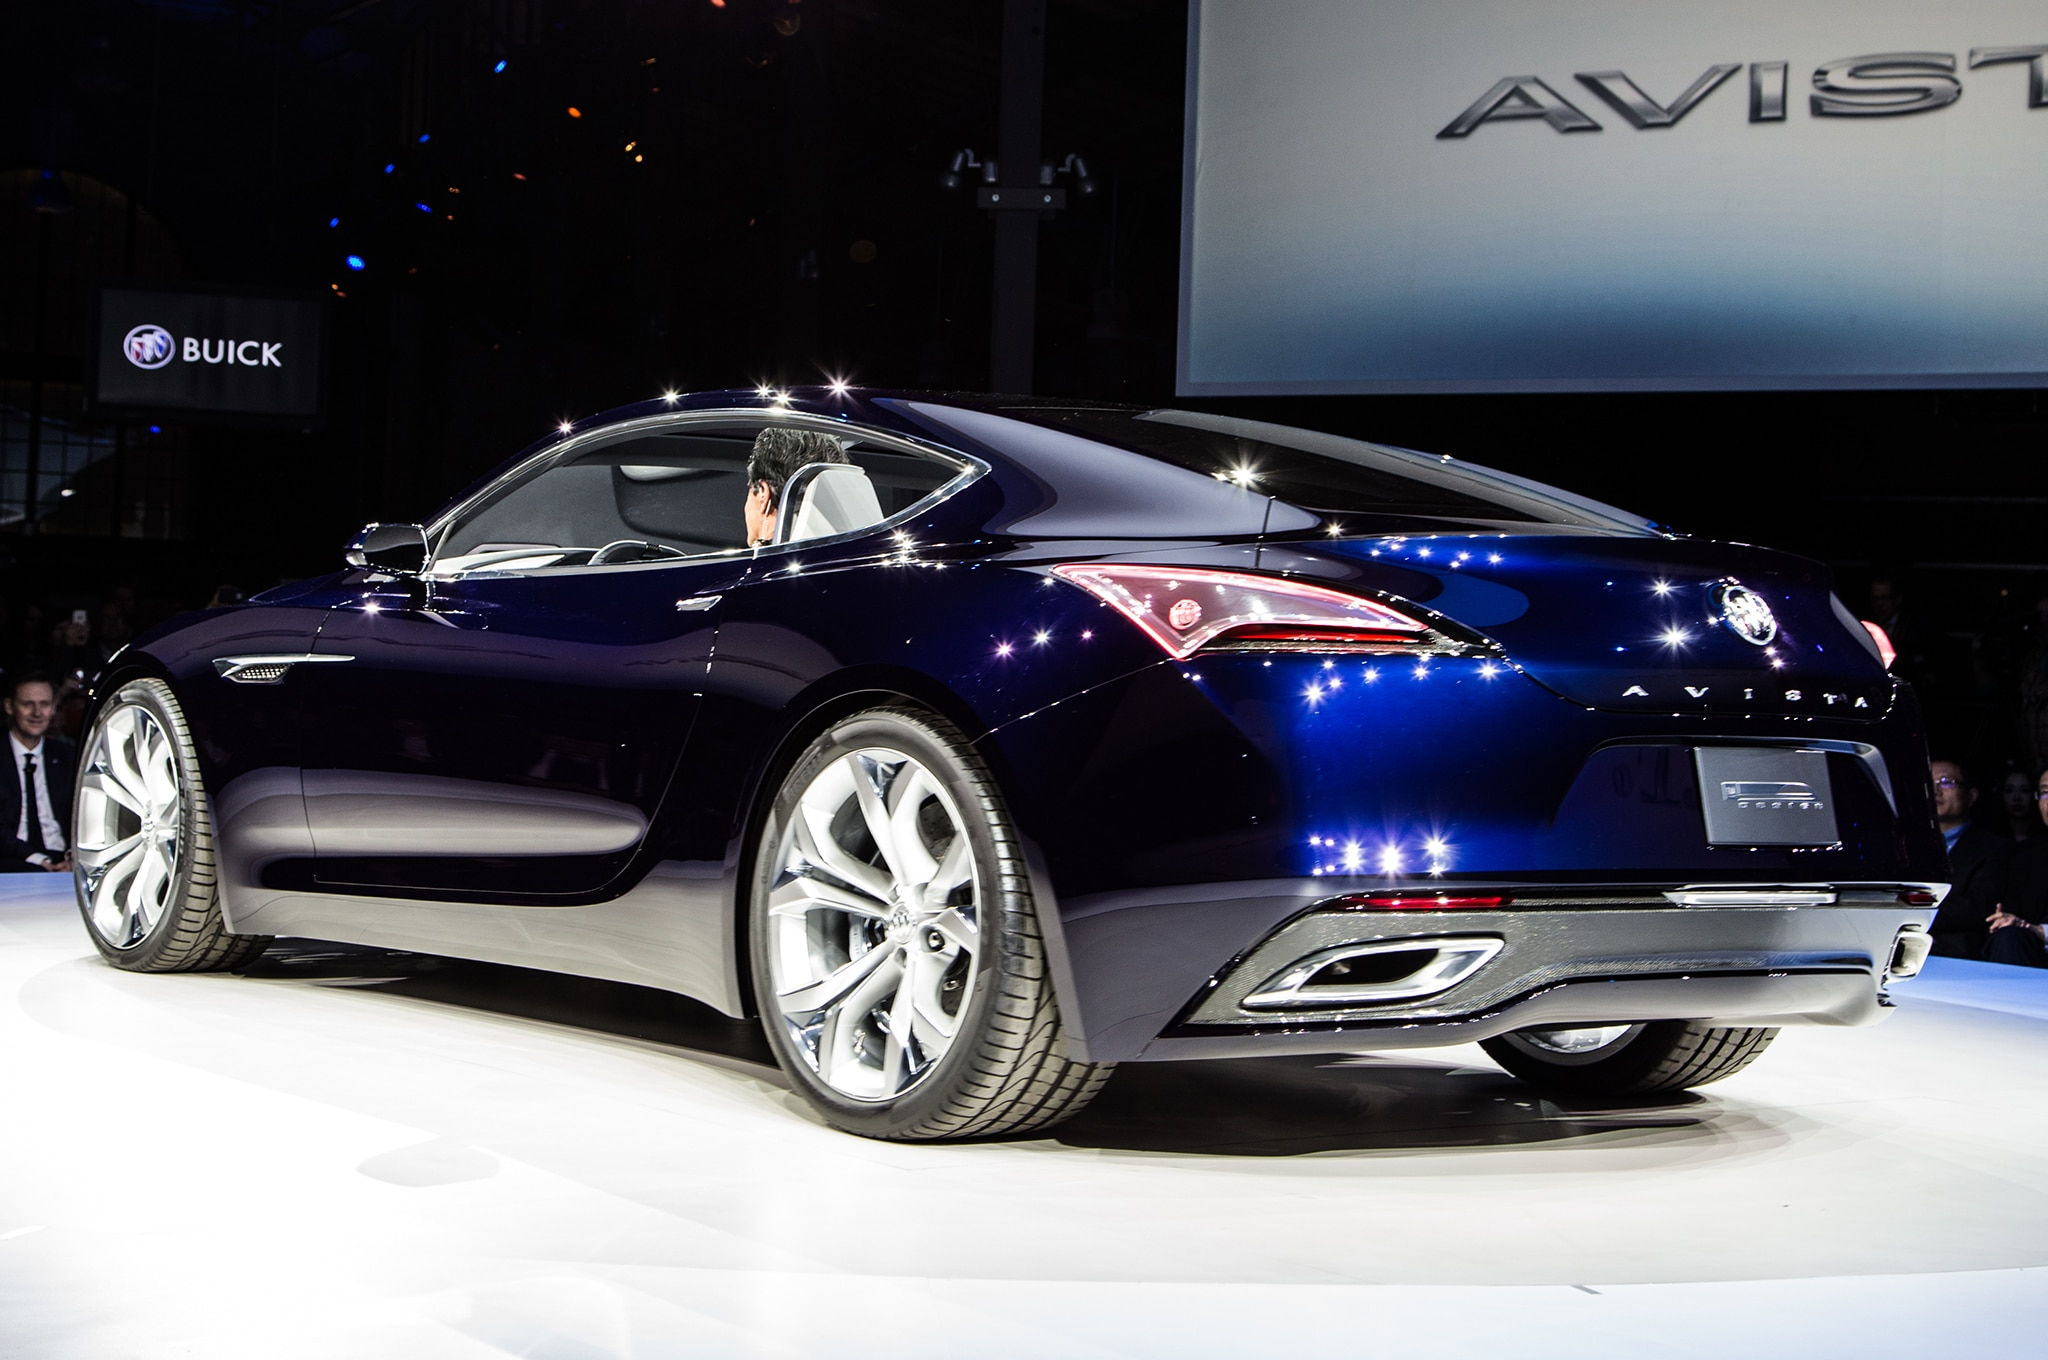 Would You Buy A Buick Avista Convertible